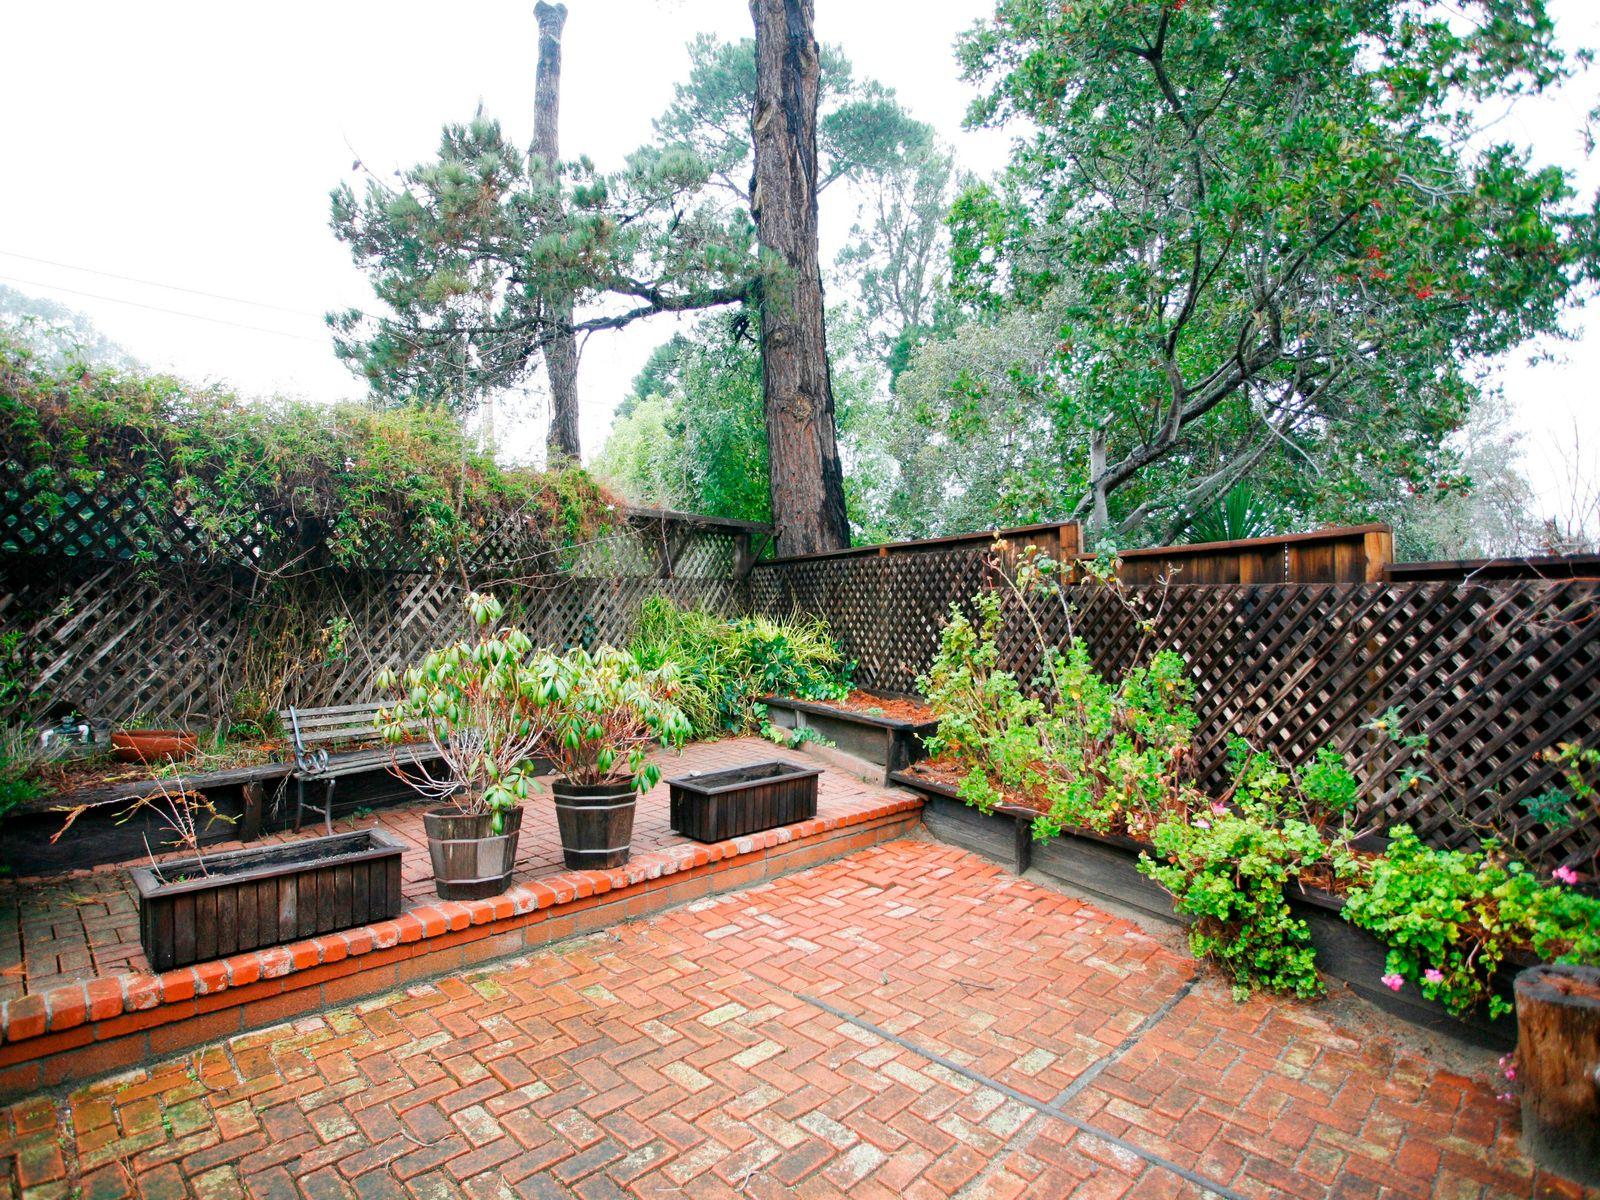 Monterey's Most Desireable Neighborhood